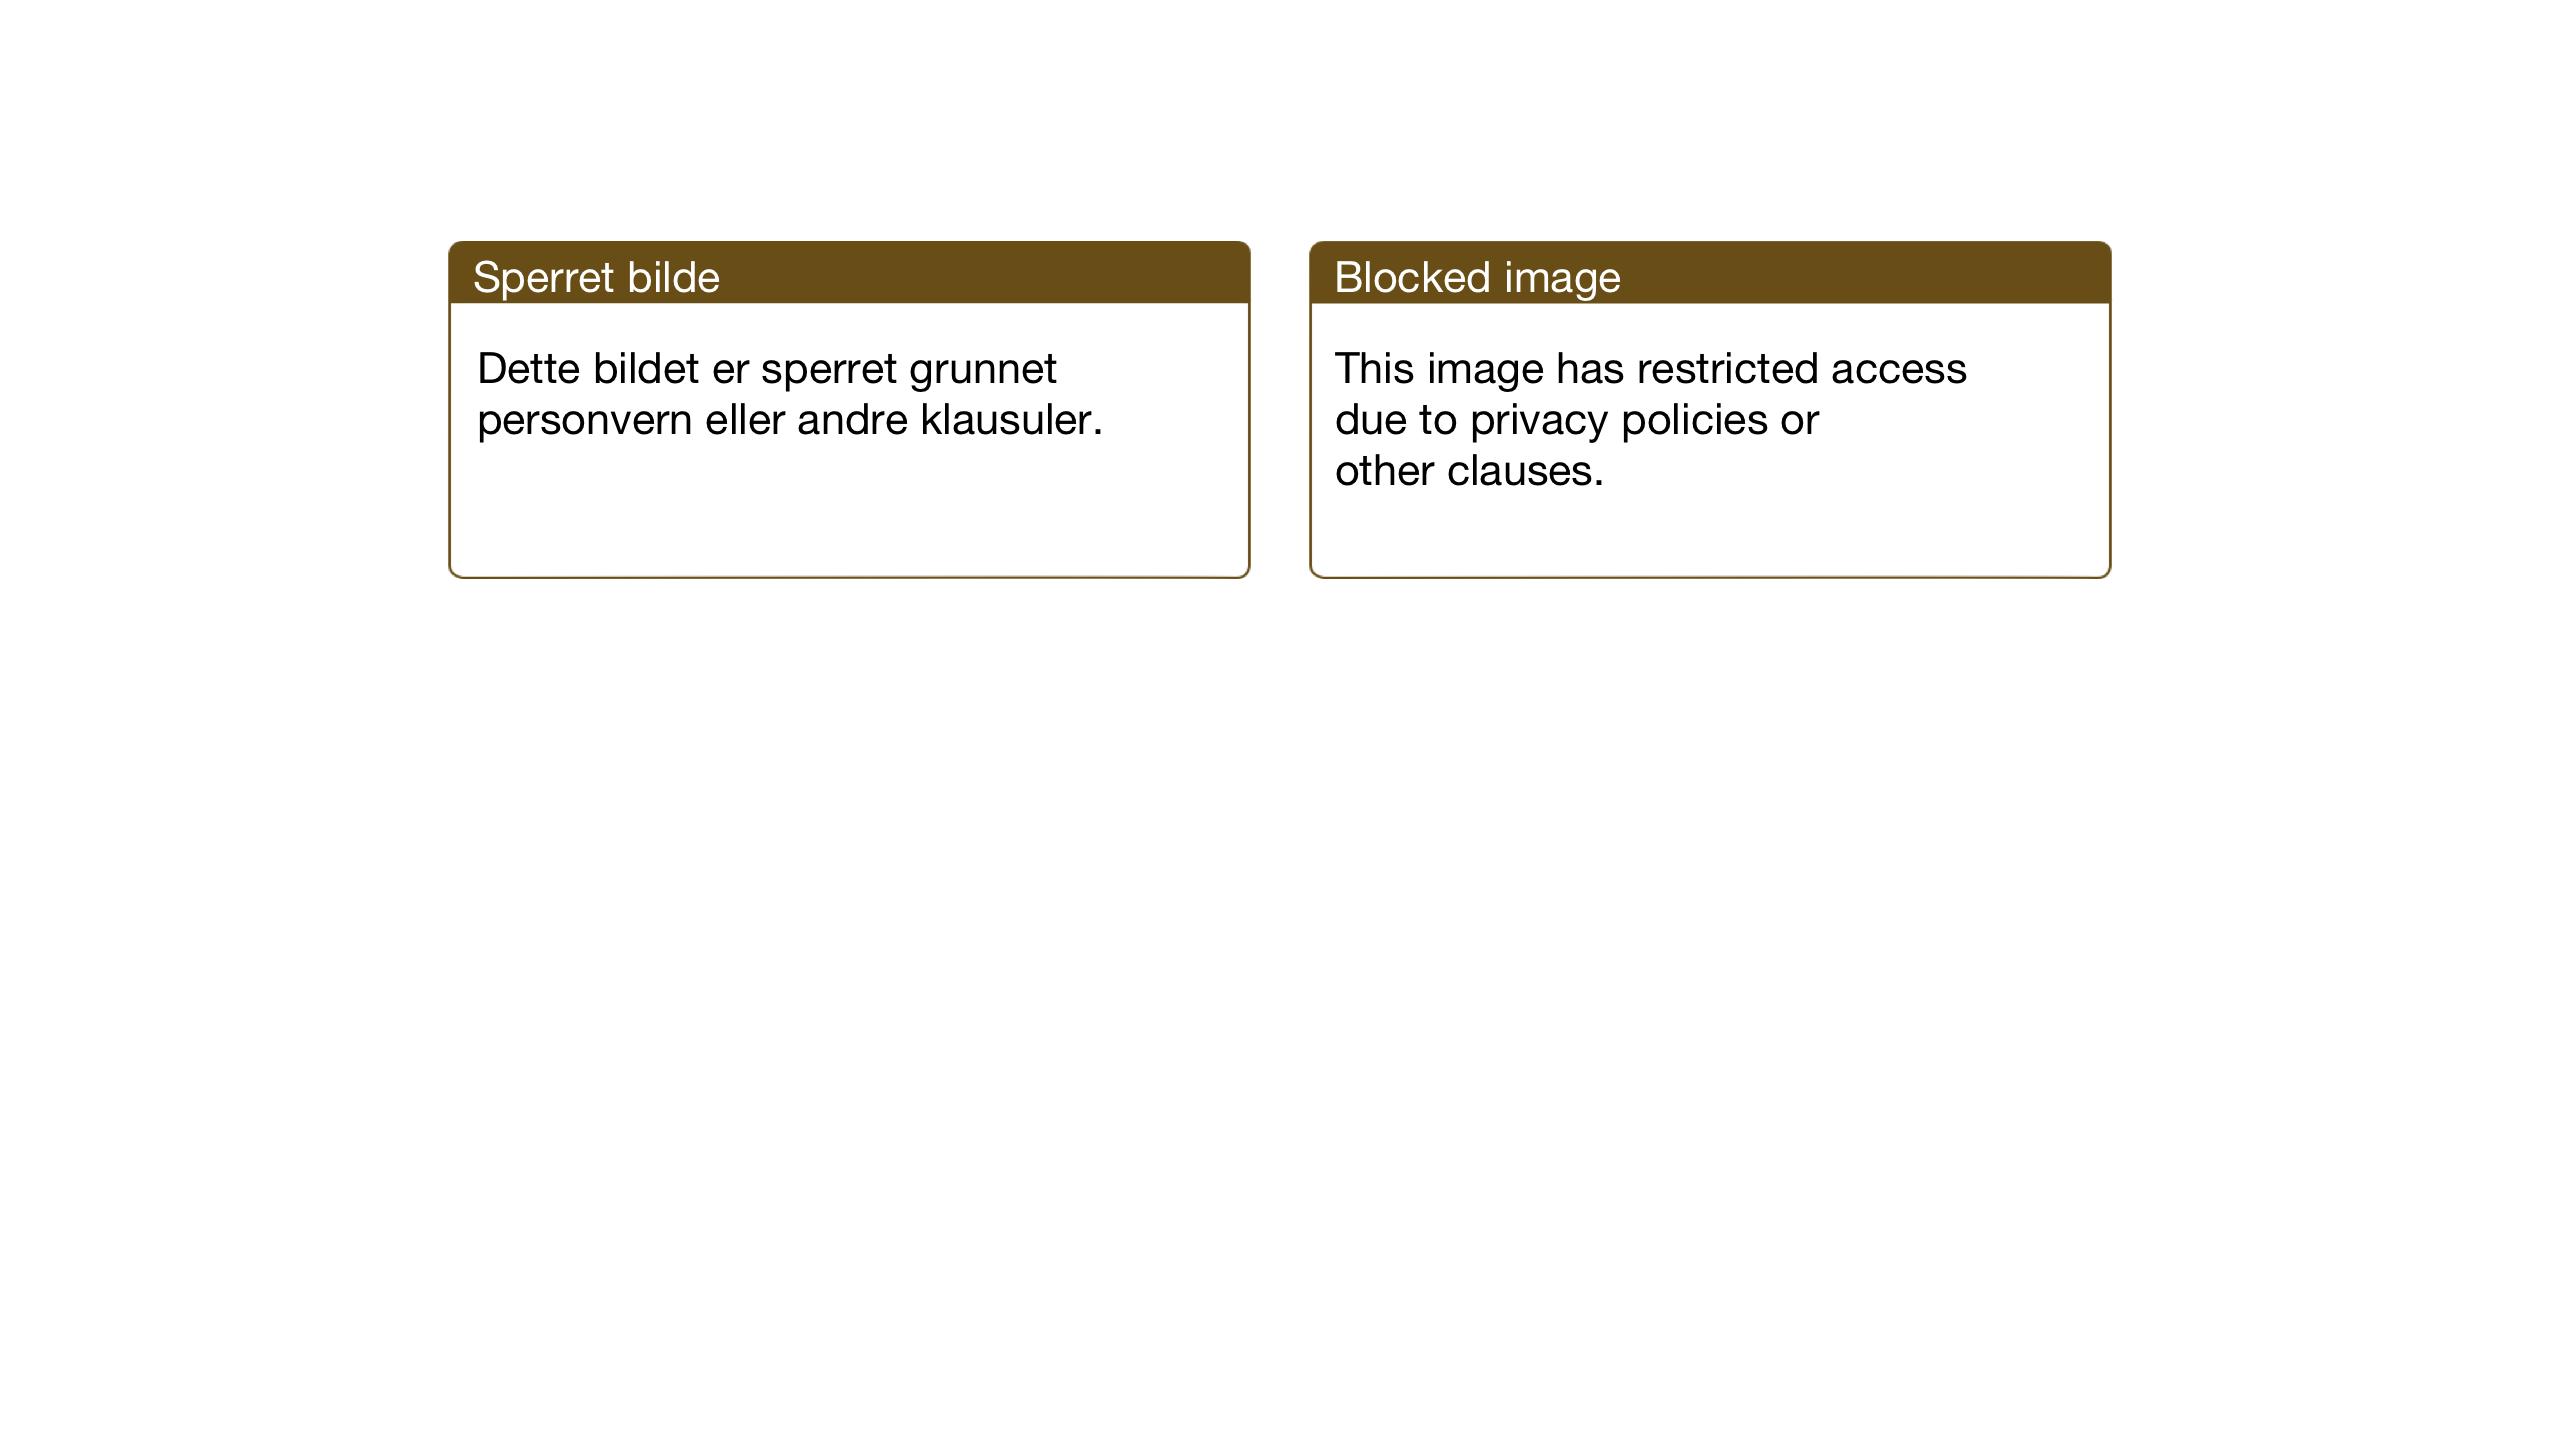 SAB, Domkirken Sokneprestembete, H/Haa: Ministerialbok nr. C 9, 1958-2001, s. 211b-212a